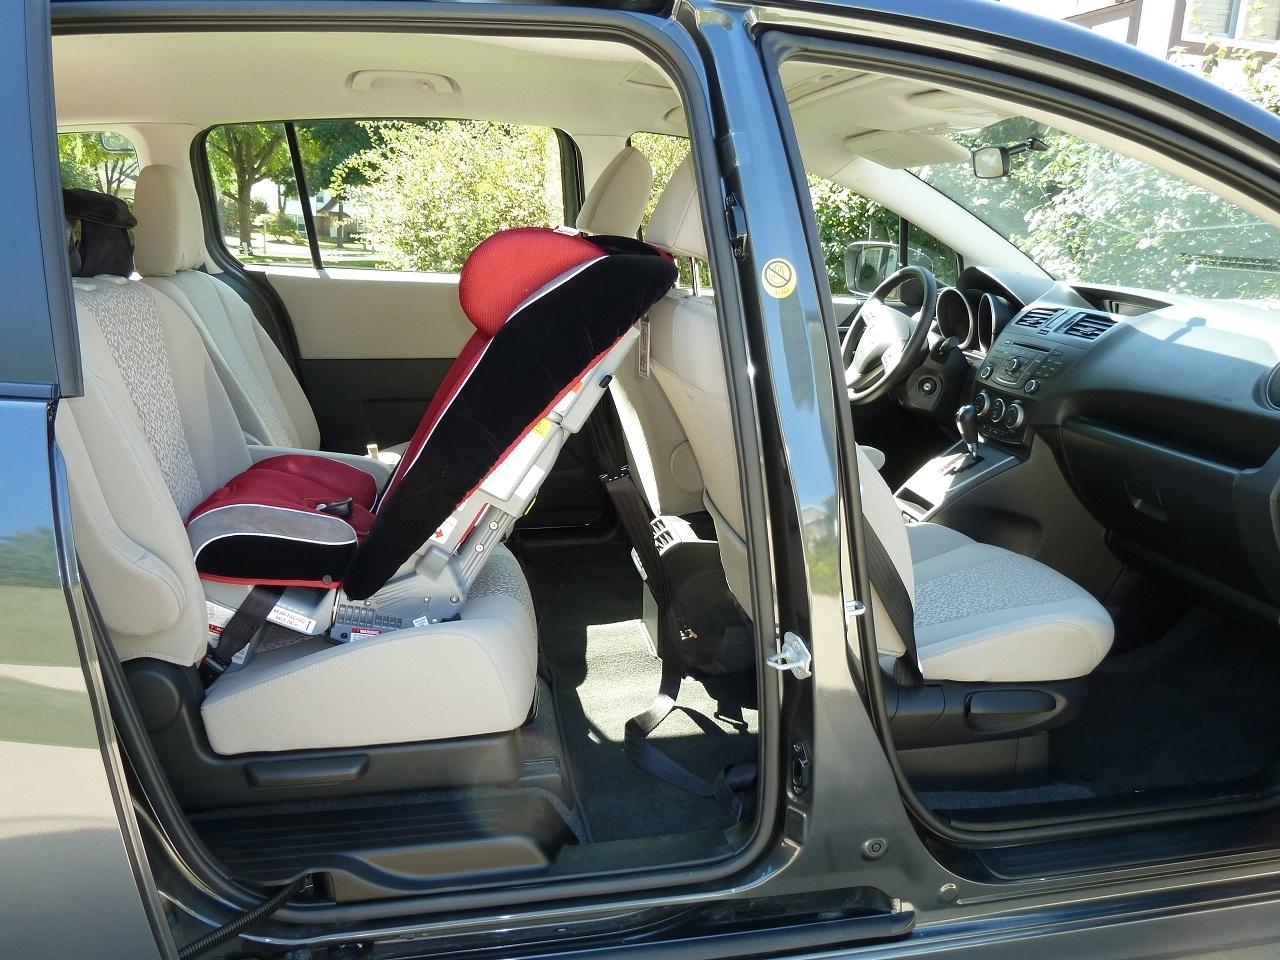 Mazda5 Sliding Door Latch1280 X 960